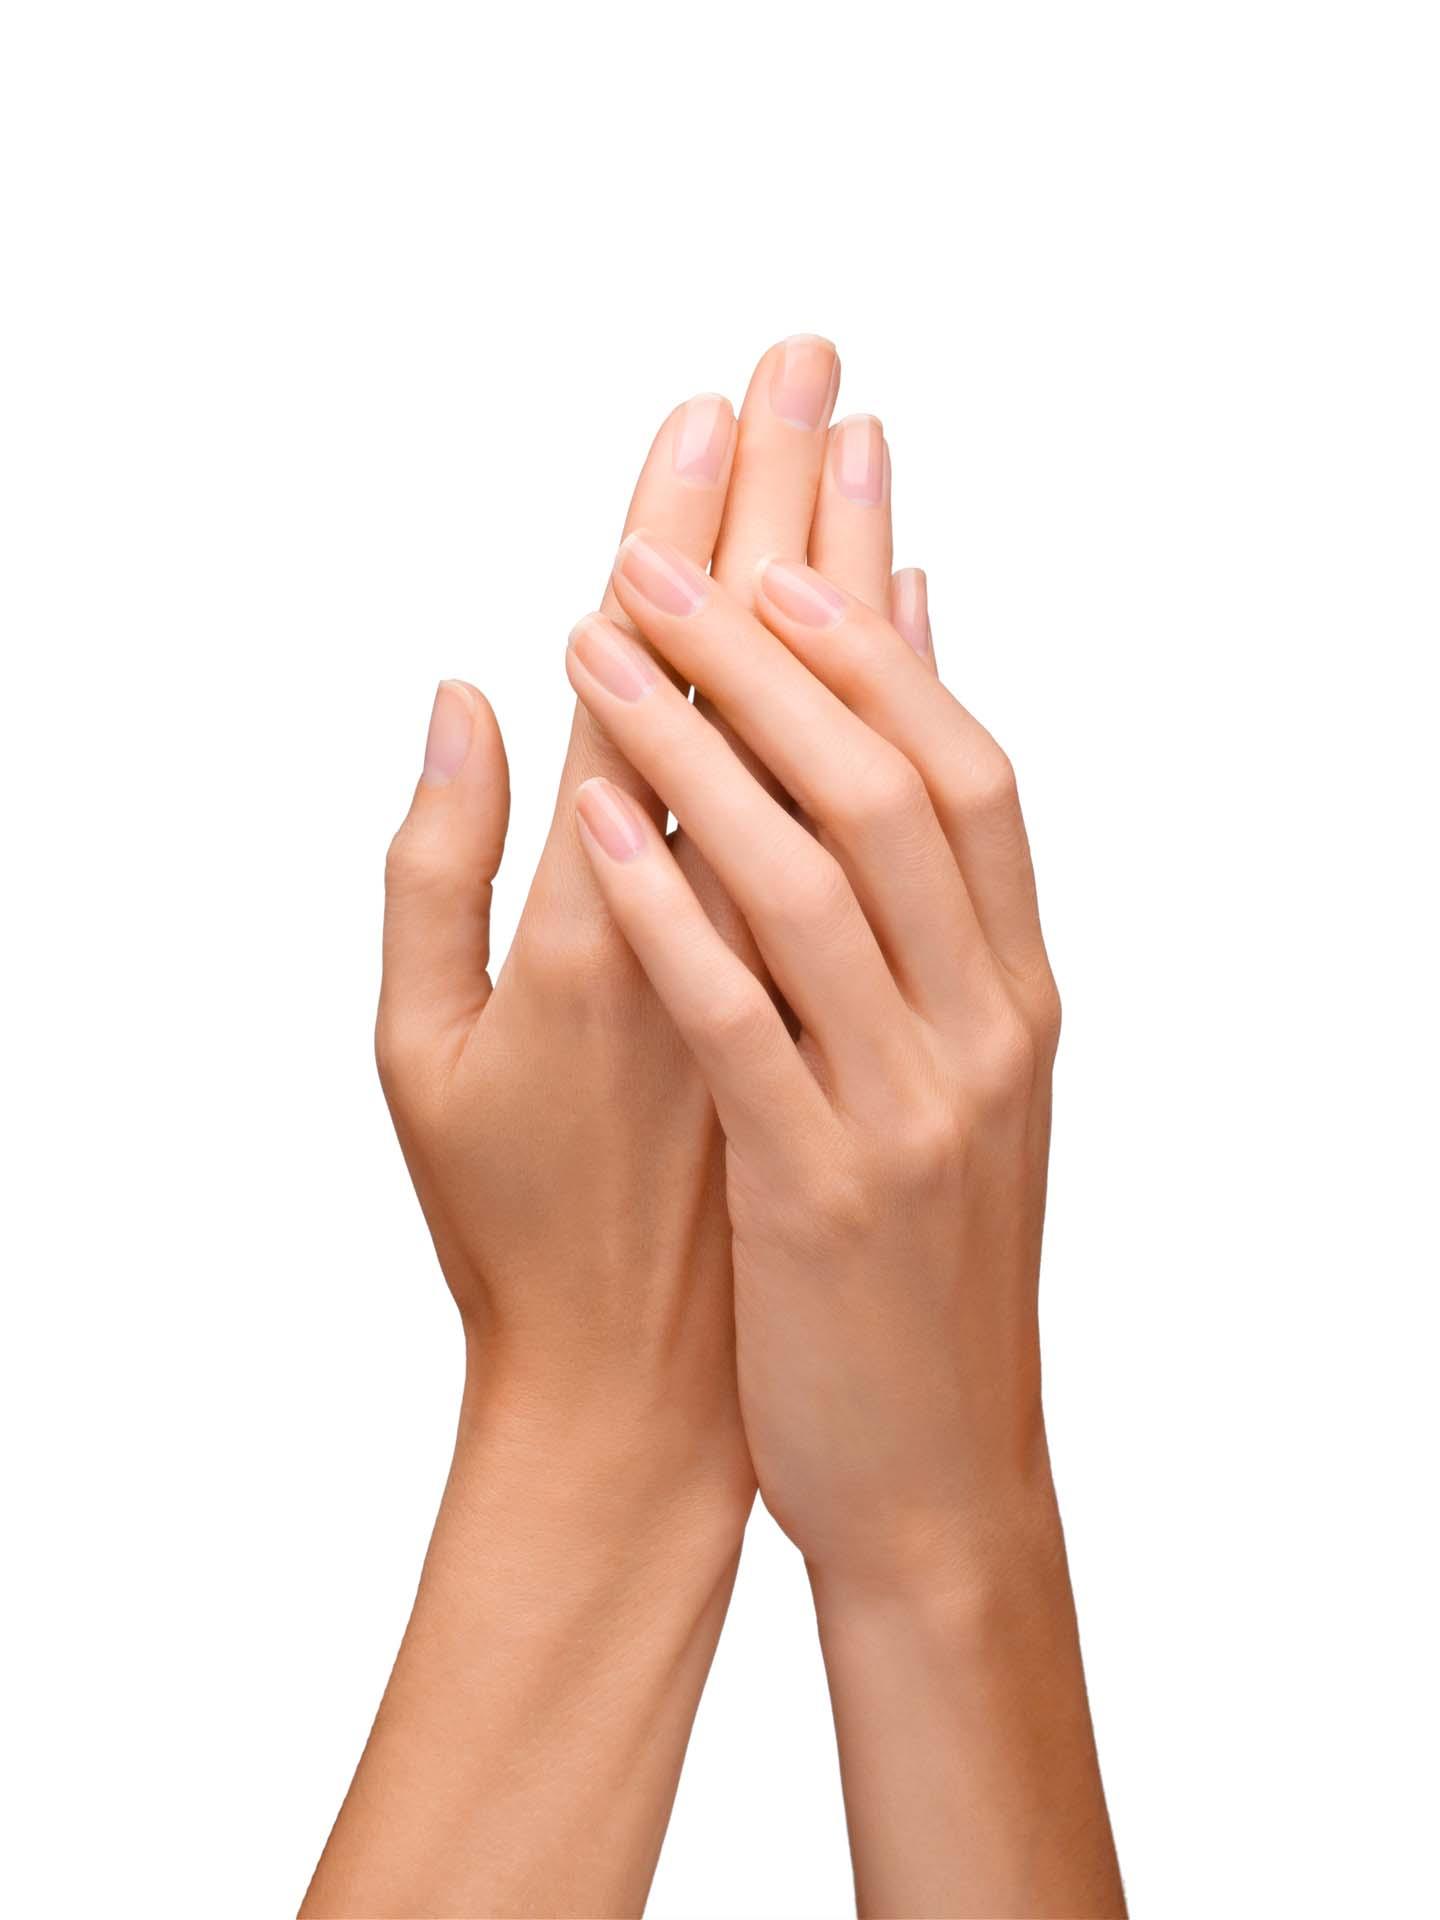 plain hands B 0010-2.jpg